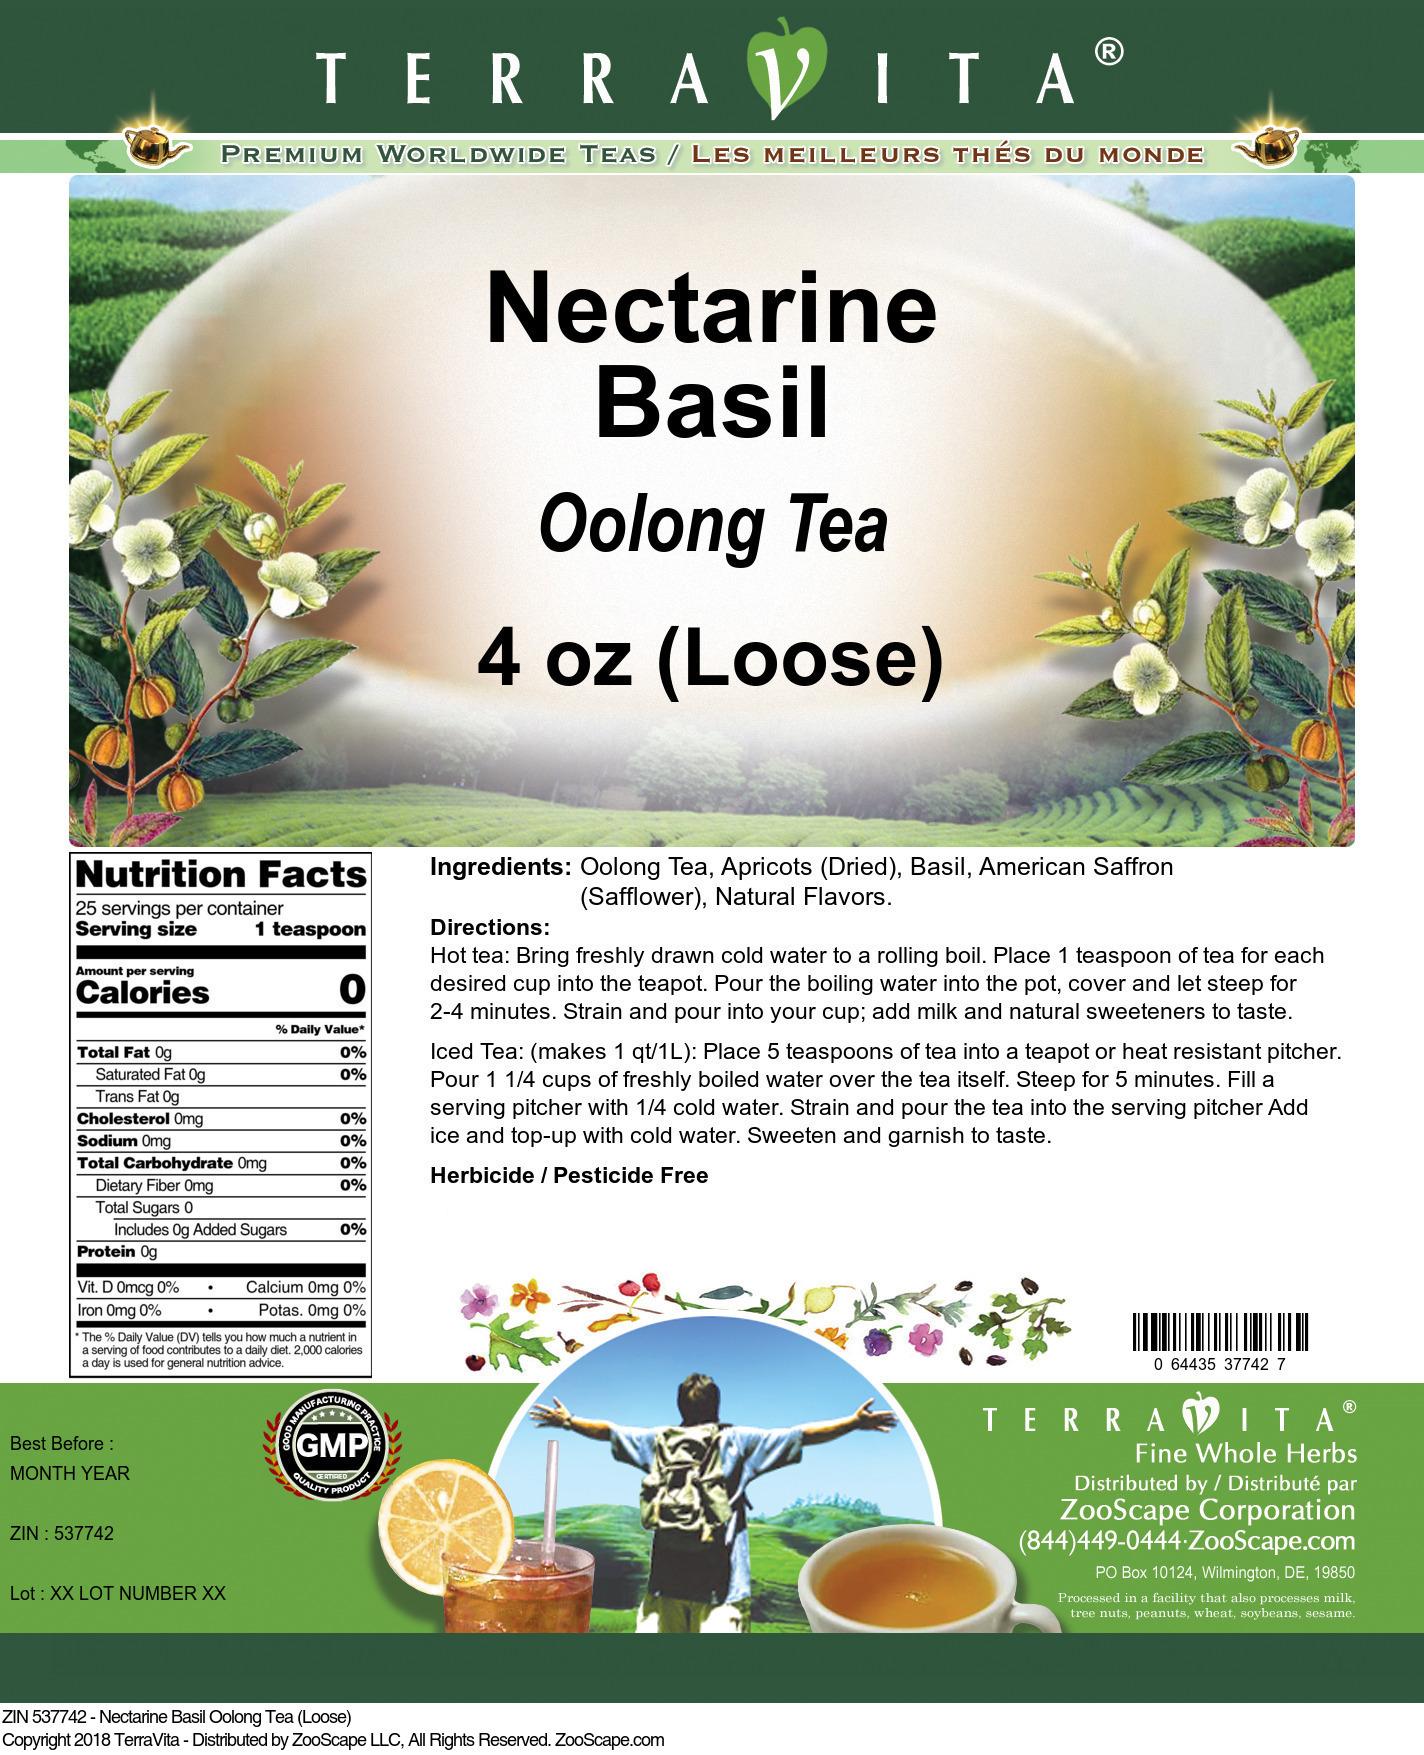 Nectarine Basil Oolong Tea